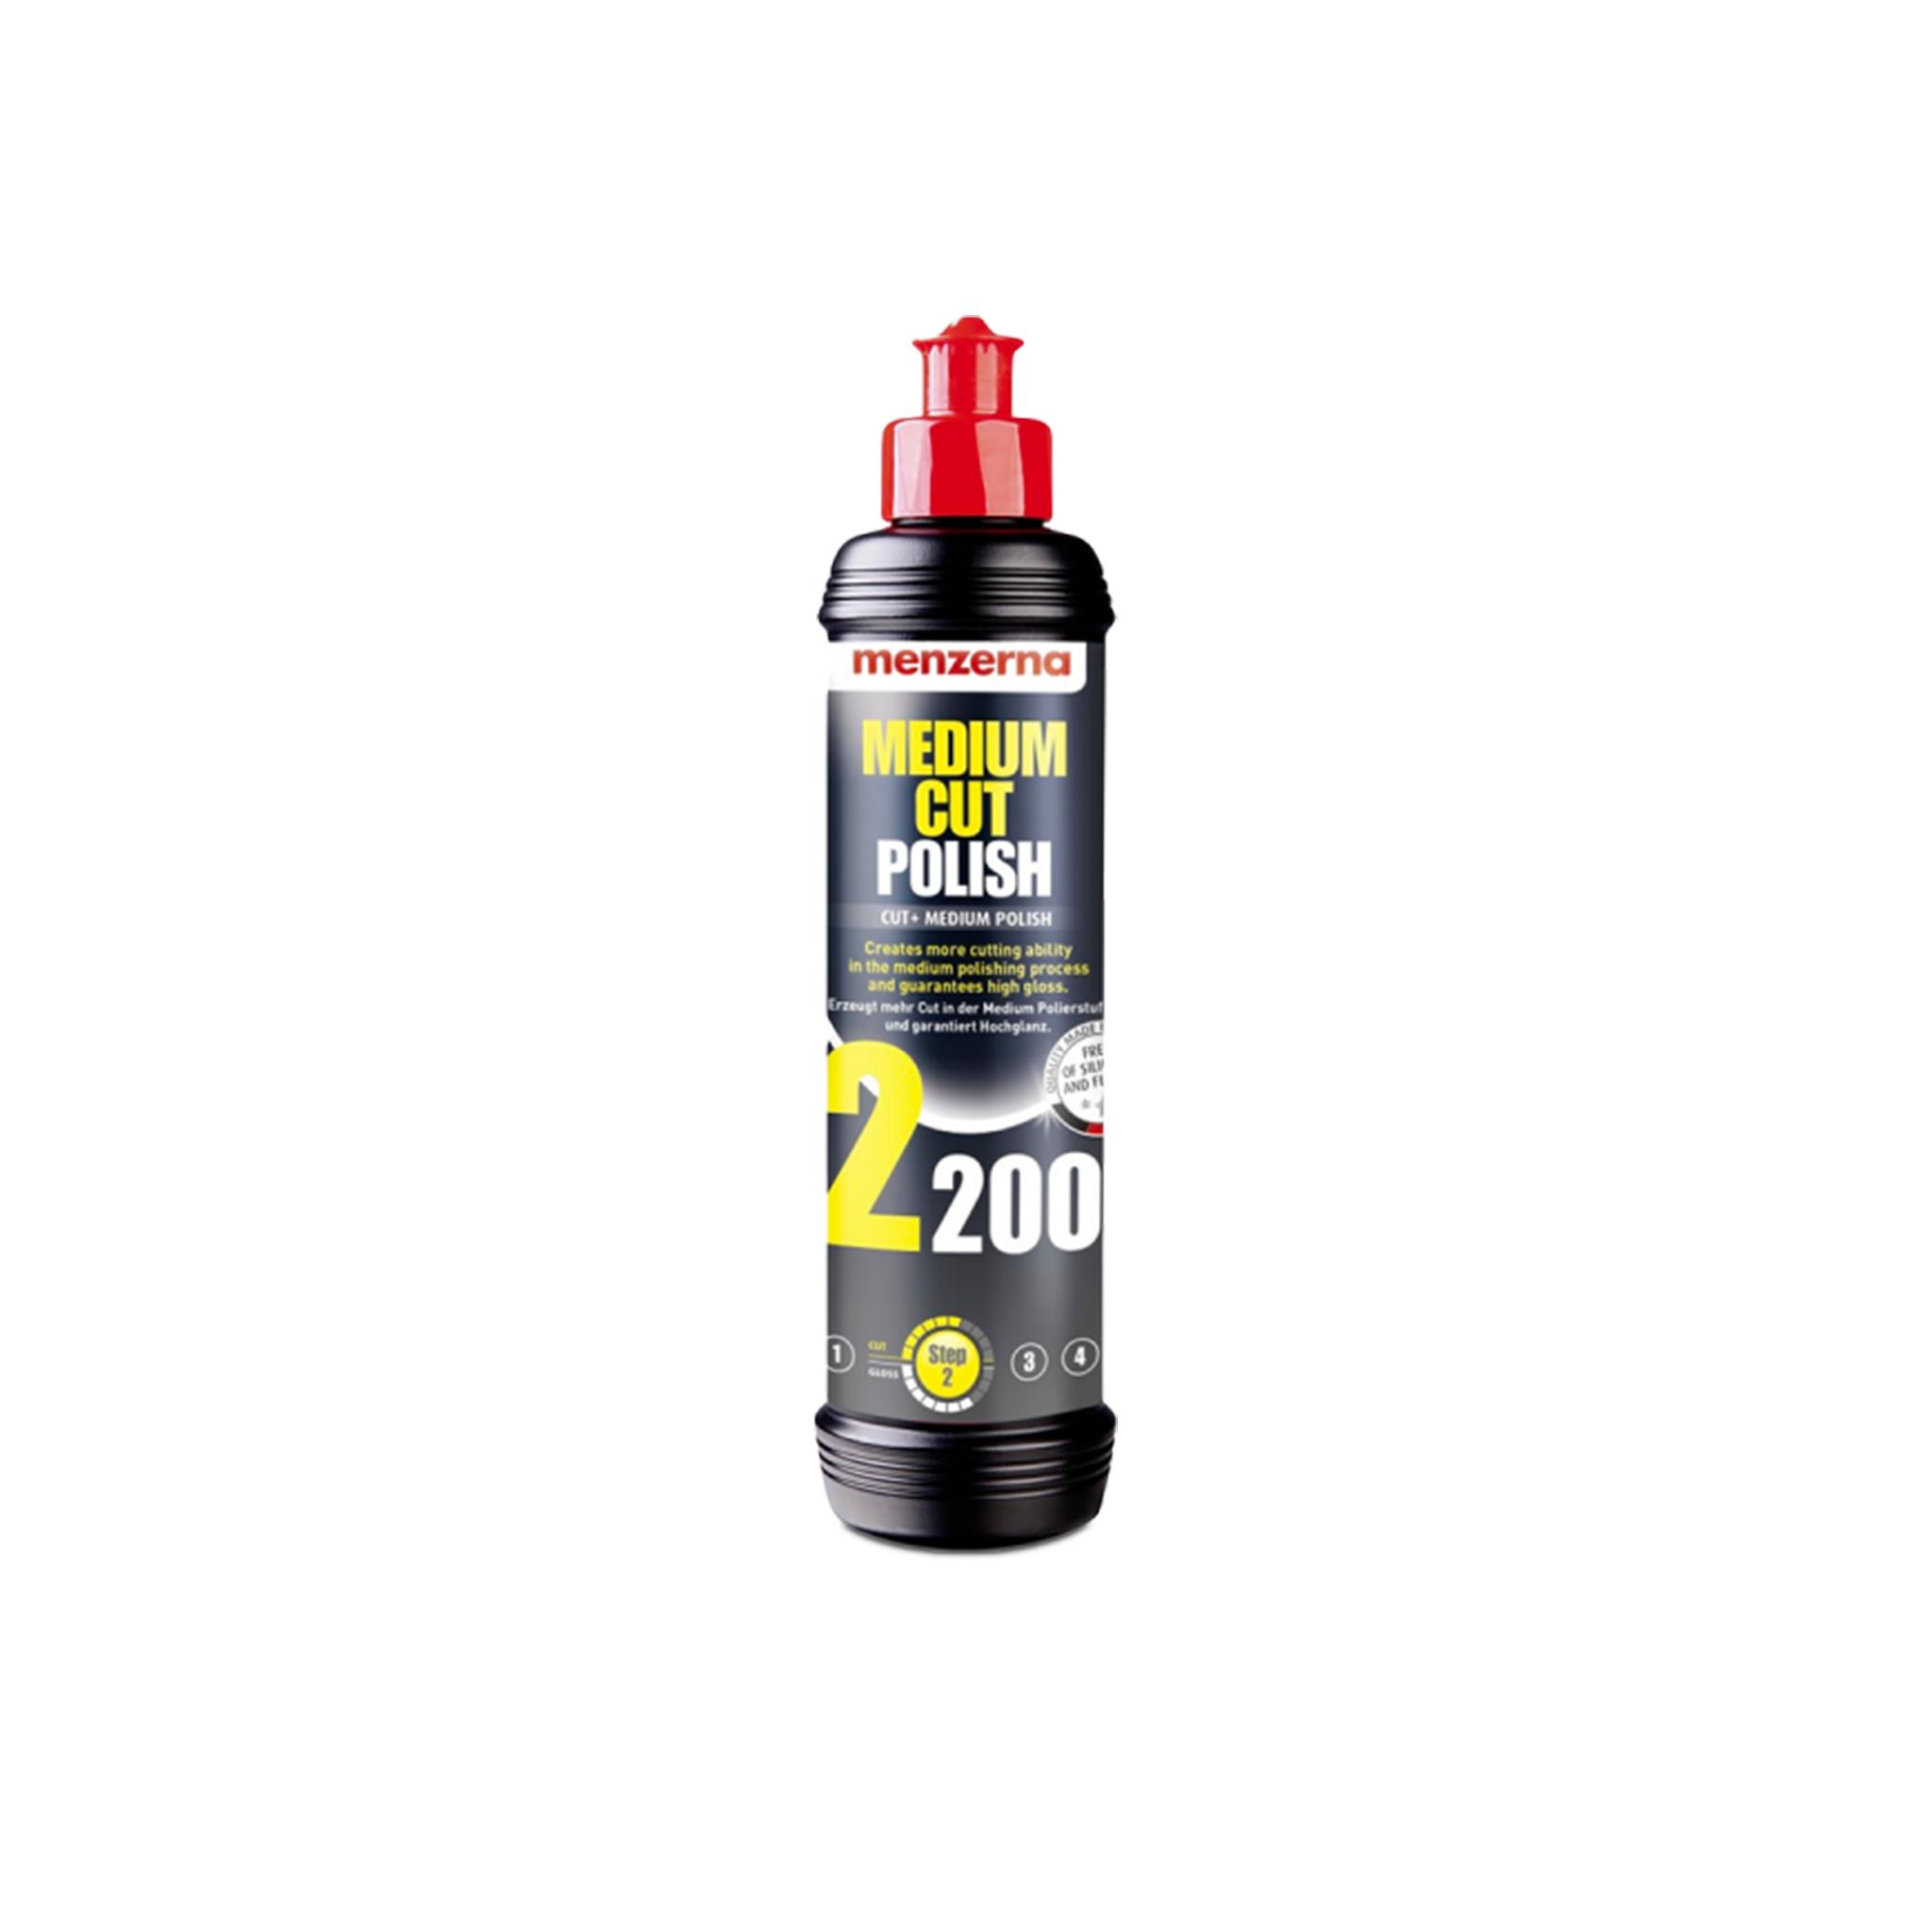 Polermedel Menzerna Medium Cut 2200- Rubbing/Polishing, 250 ml